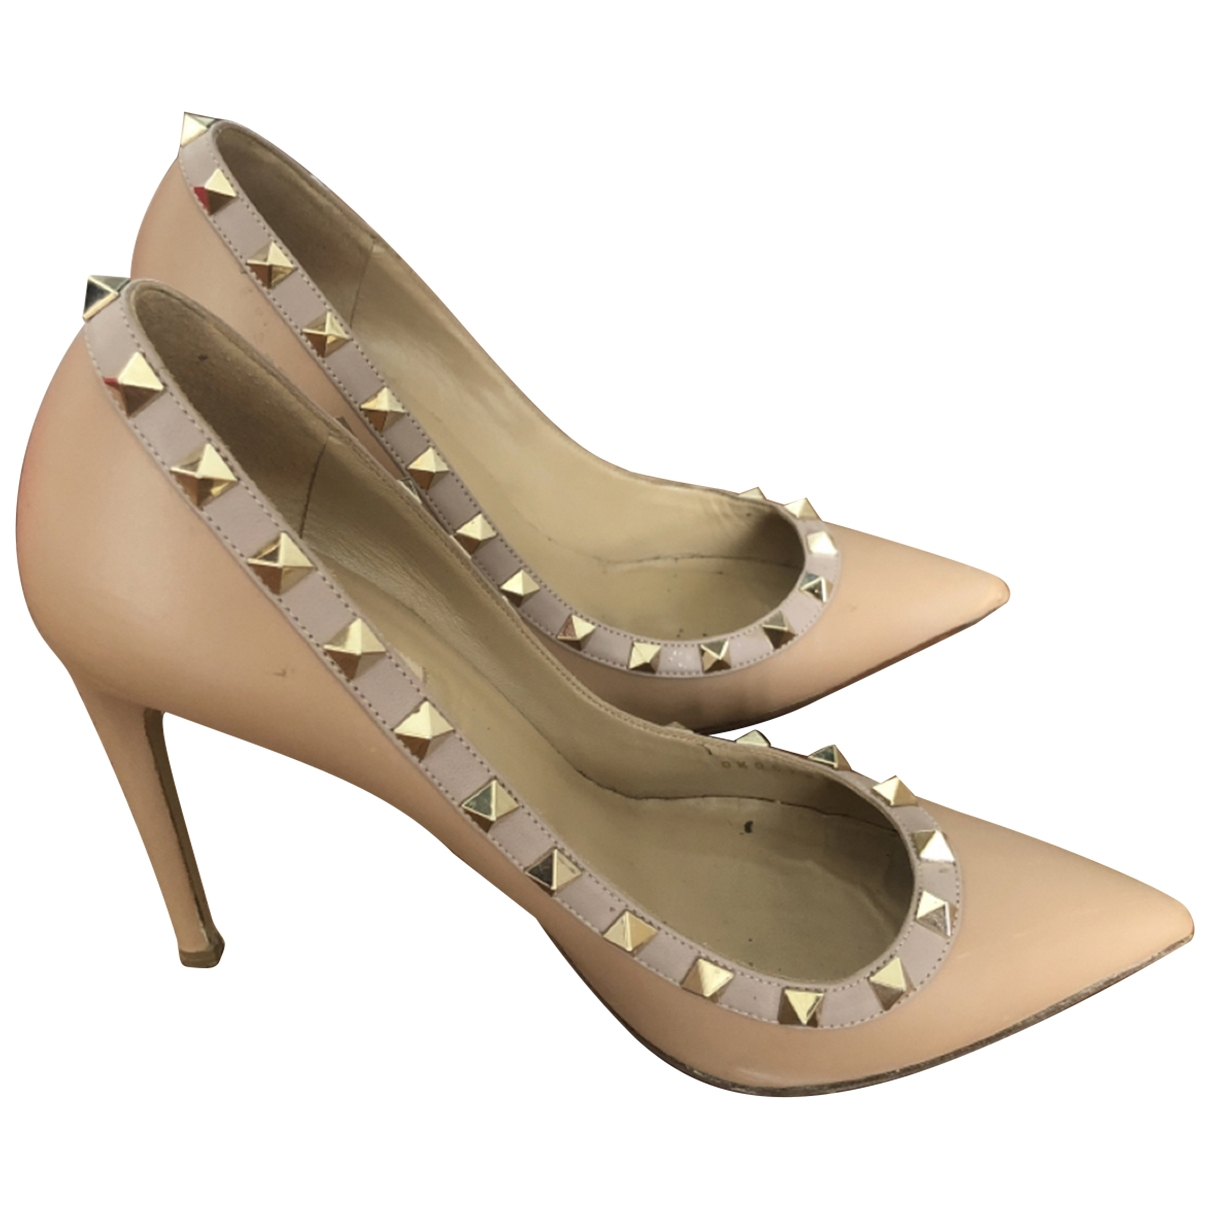 Valentino Garavani Rockstud Beige Leather Heels for Women 38 EU